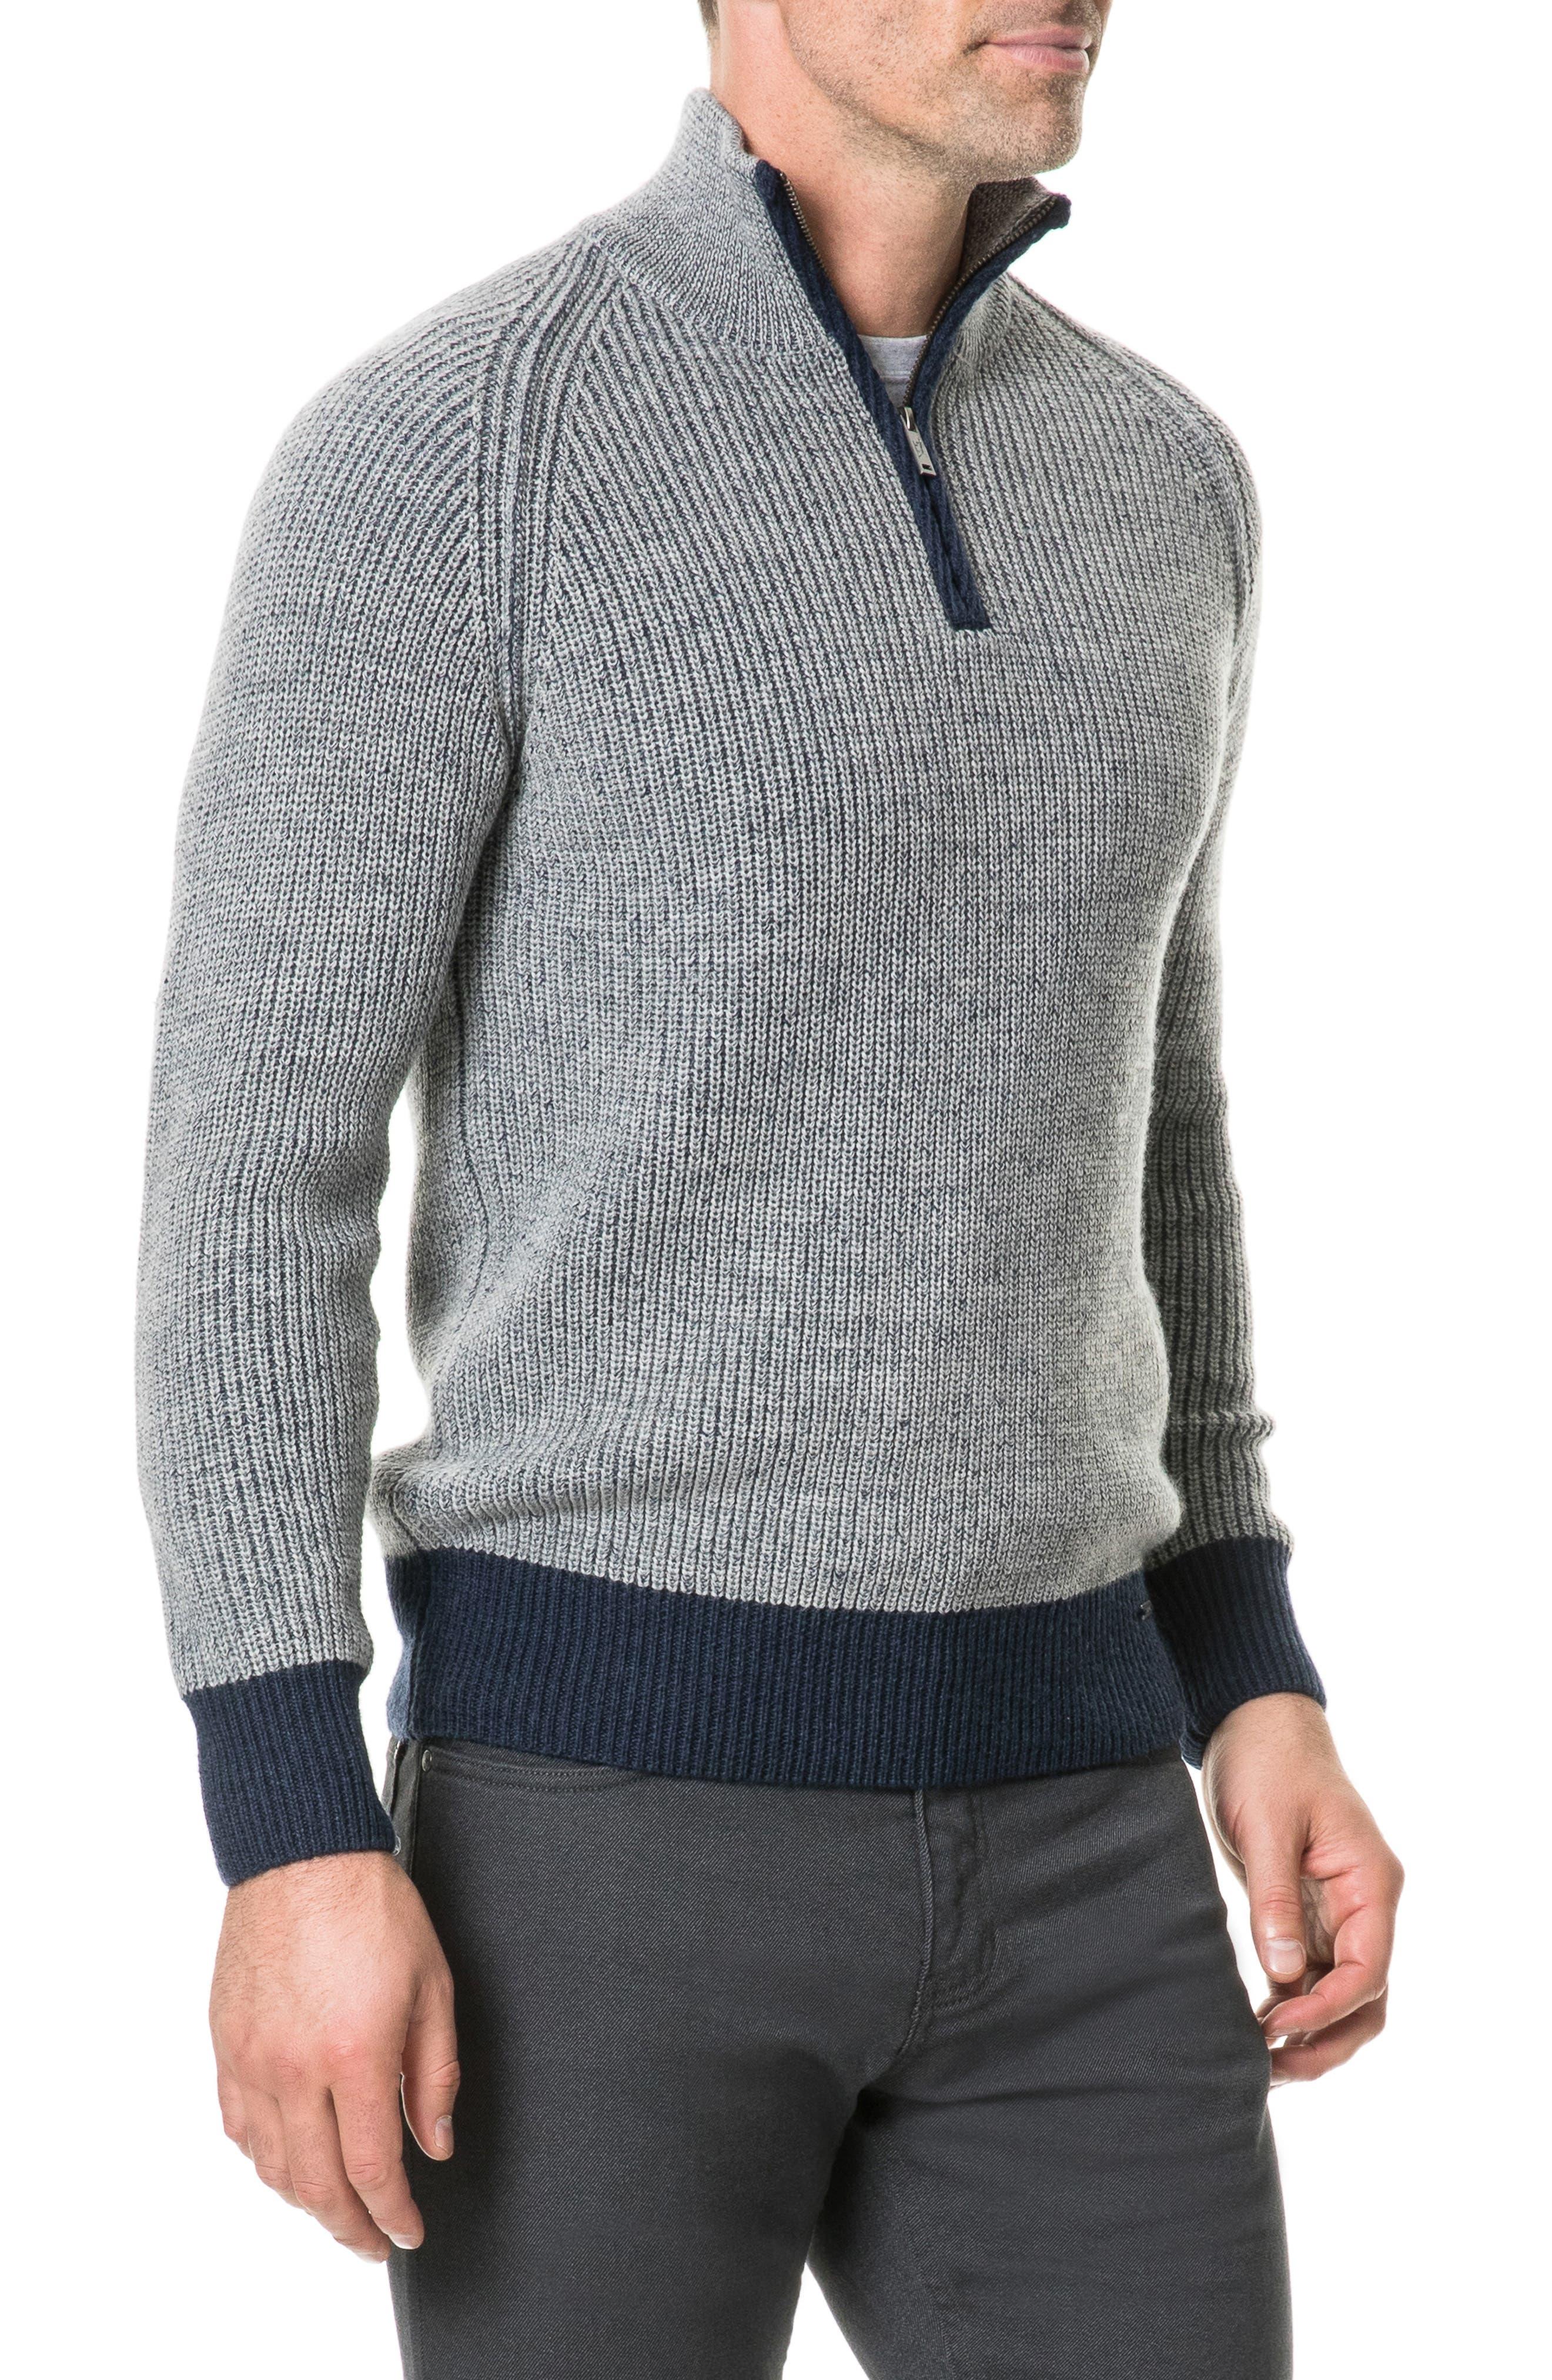 Mackinder Quarter Zip Merino Wool Sweater,                             Alternate thumbnail 3, color,                             268